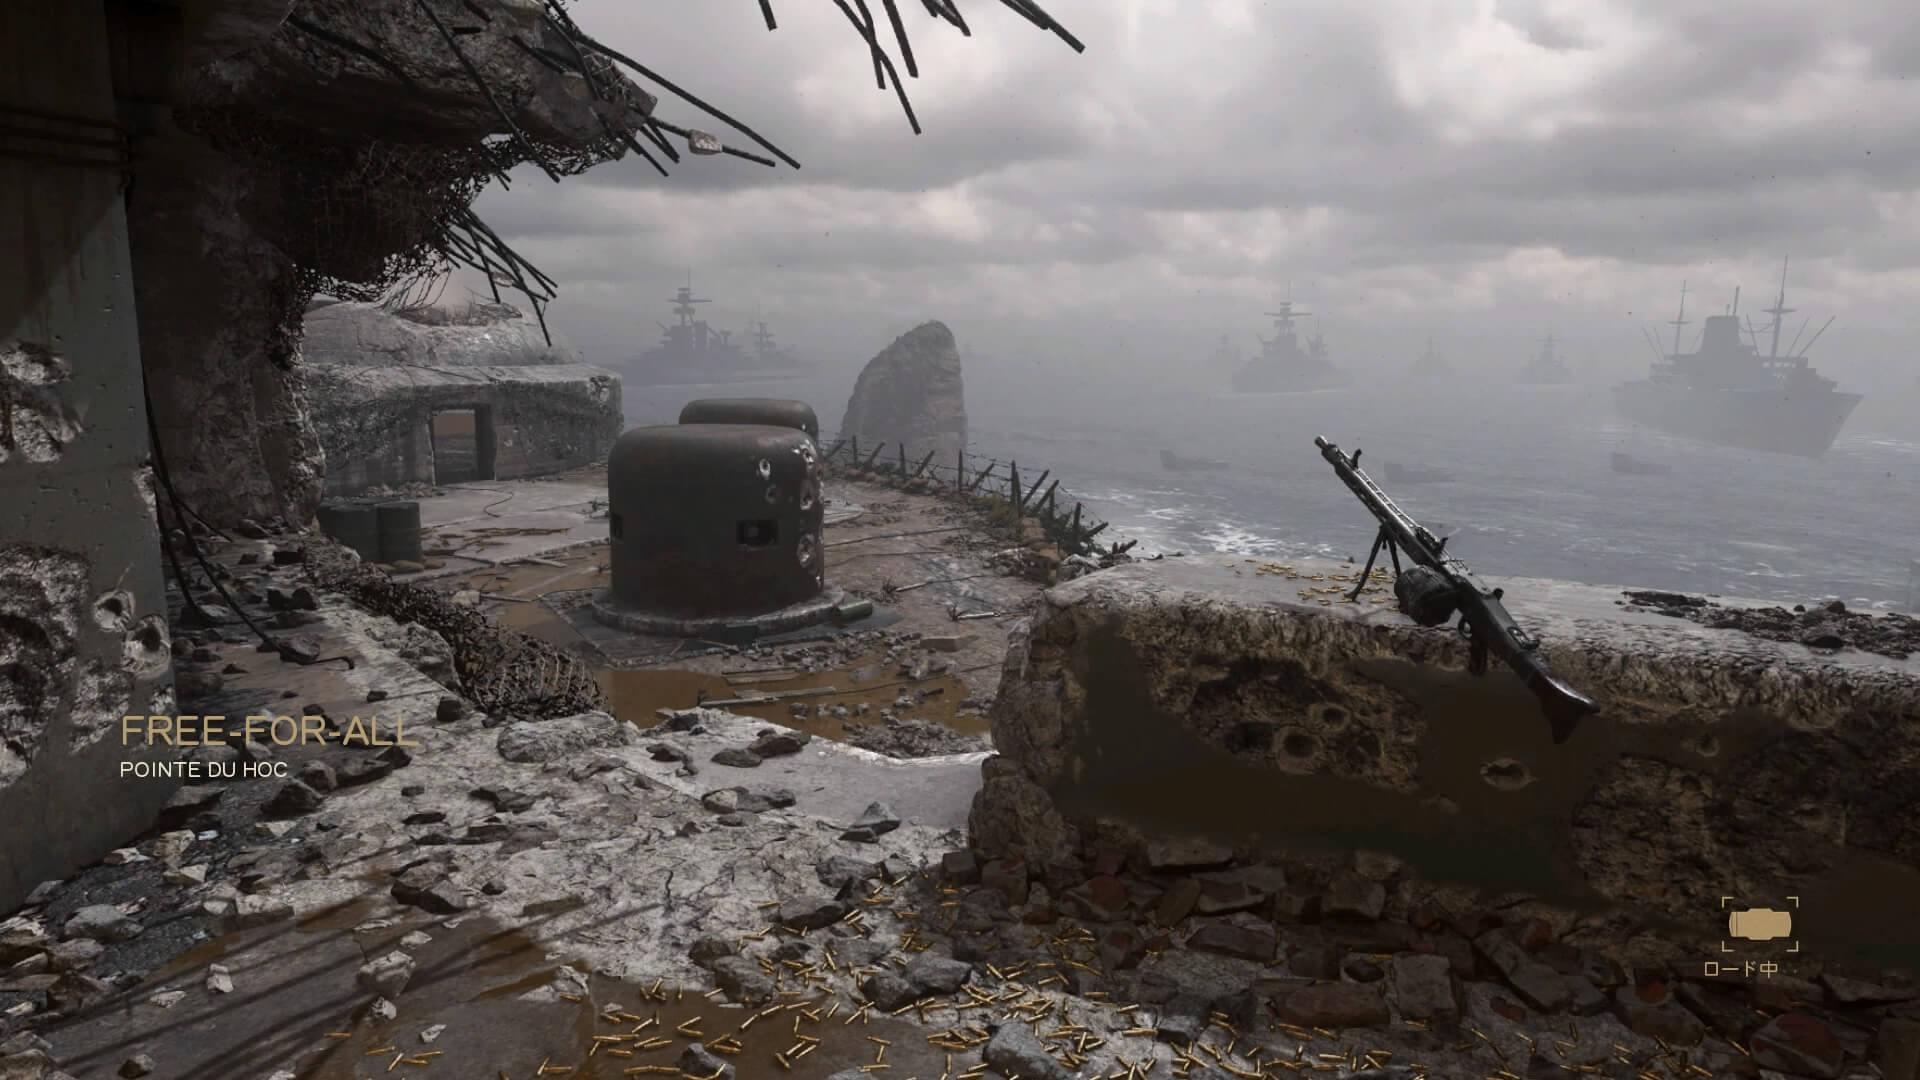 【CoD:WW2】POINTE DU HOCでの戦い方、立ち回り、強ポジについて【FFA】